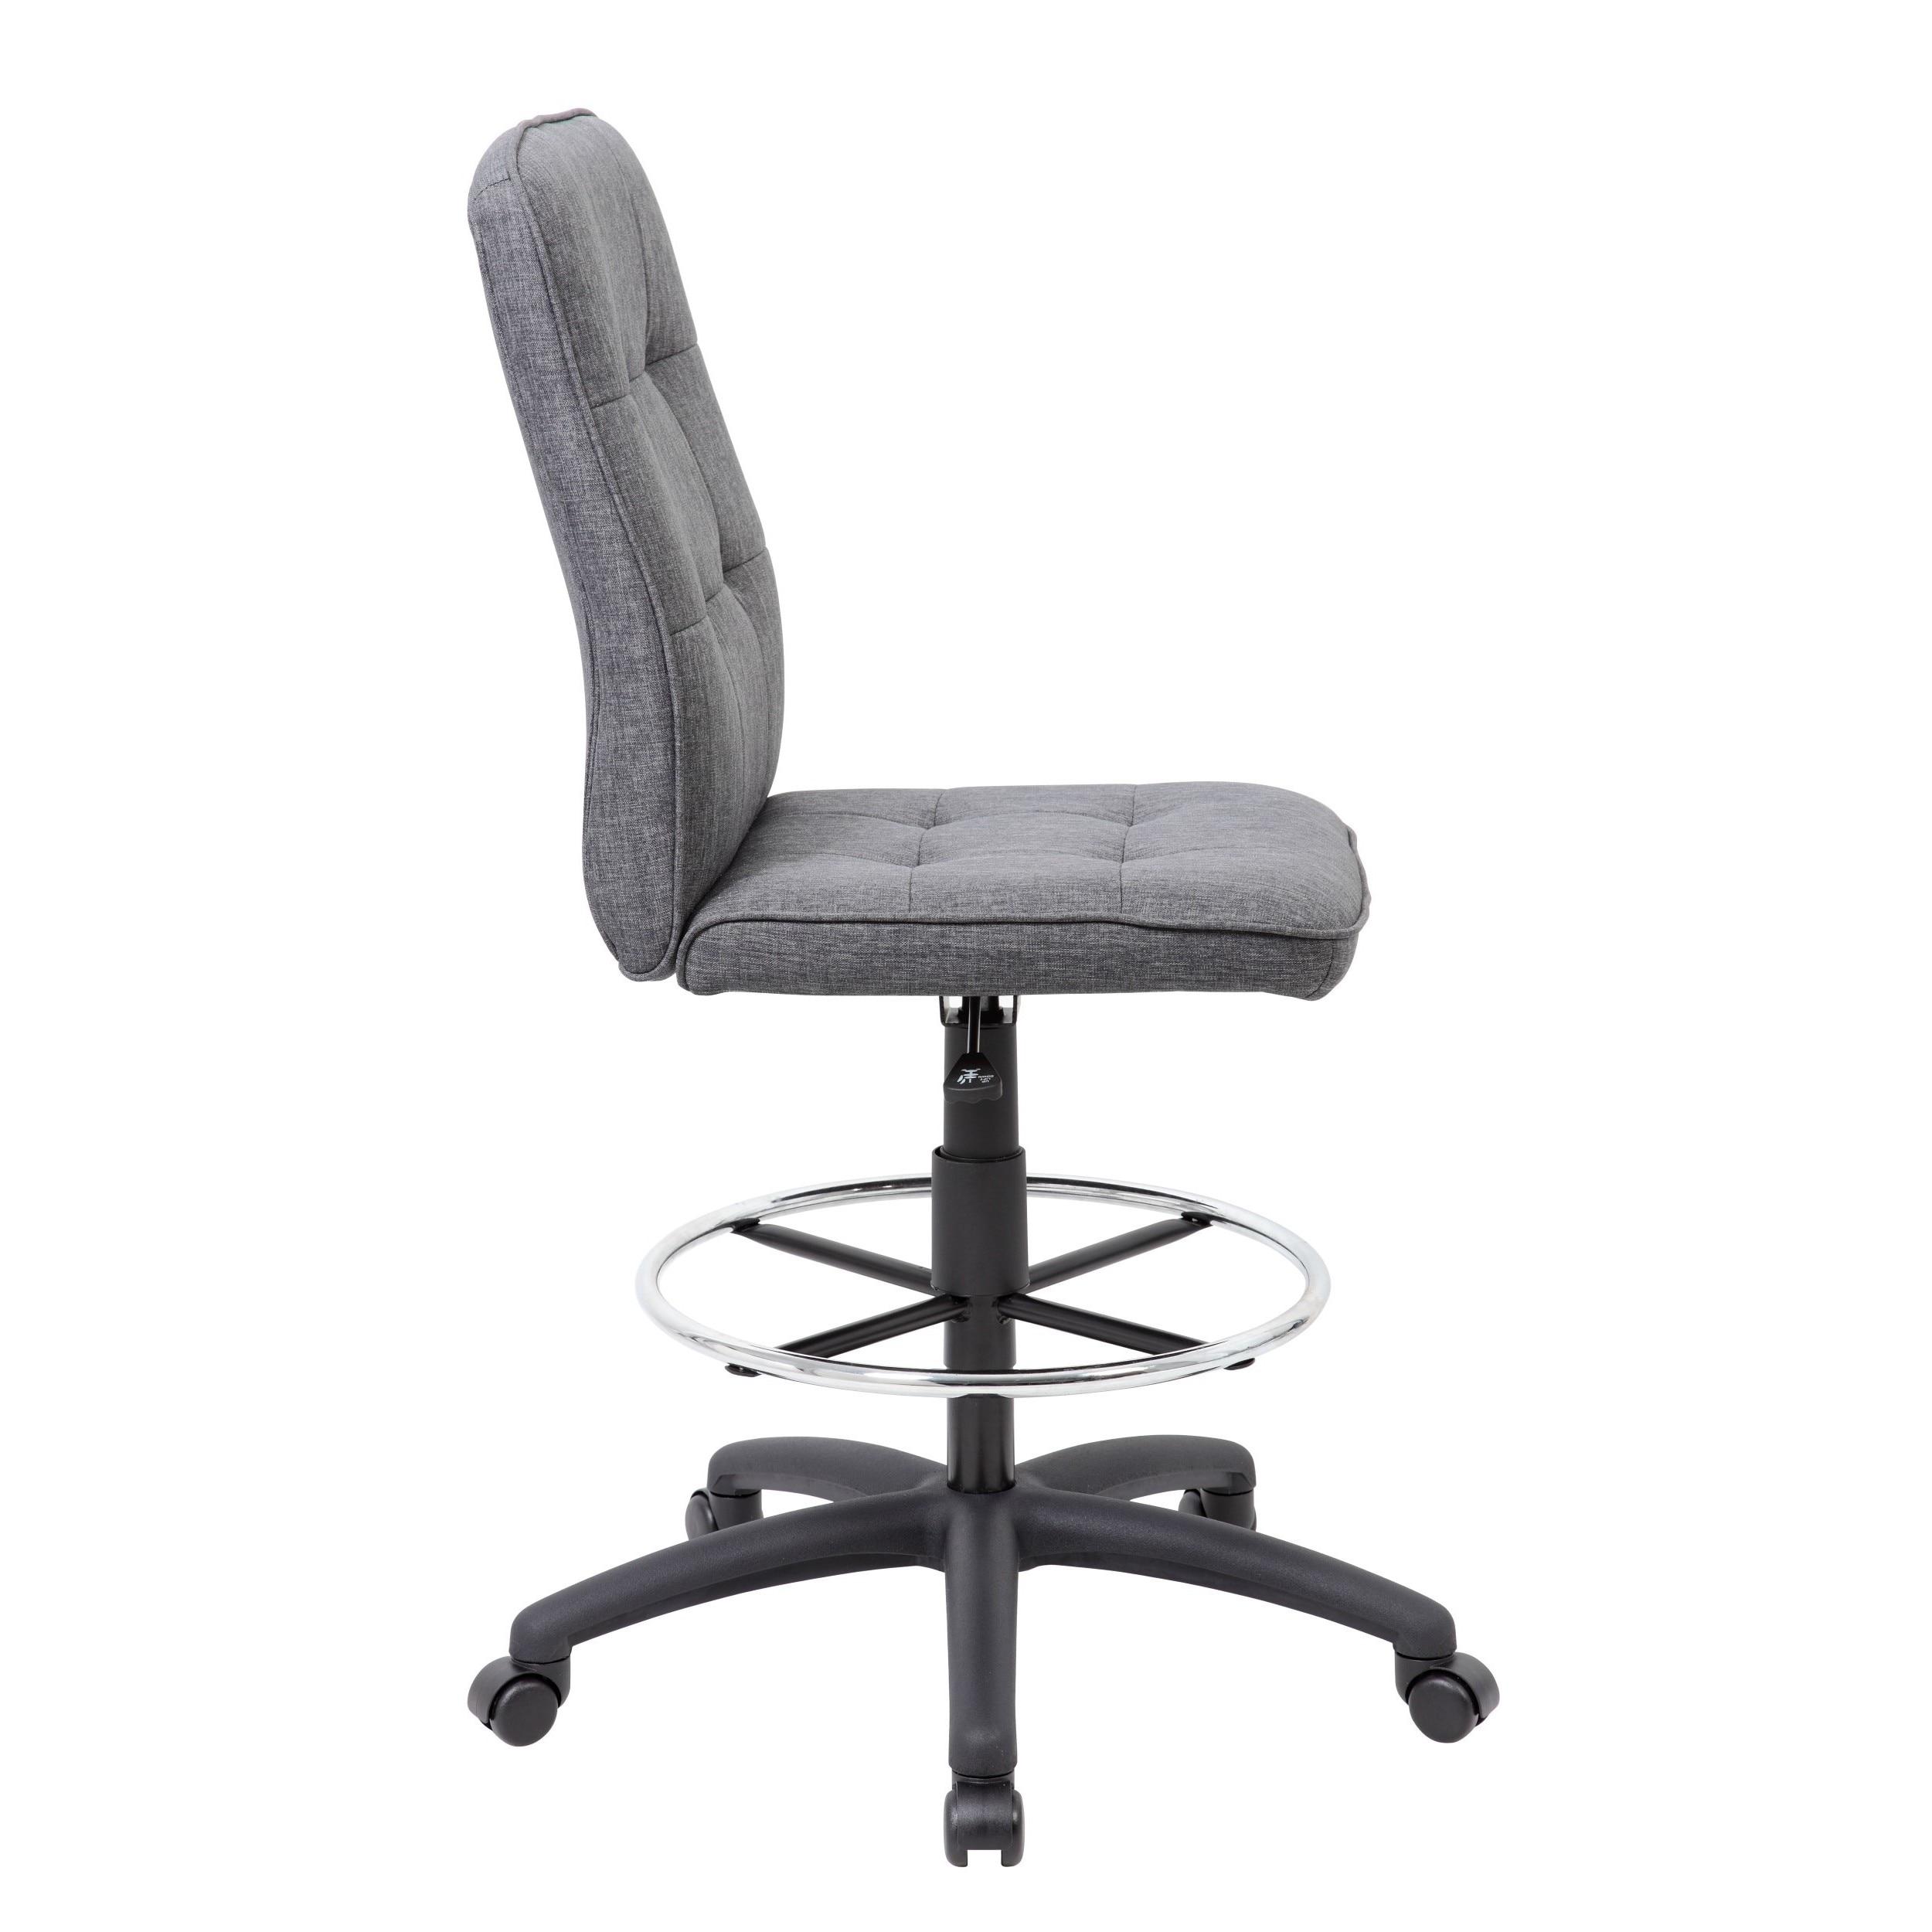 Merveilleux Shop Boss Fabric Modern Ergonomic Drafting Chair   Free Shipping Today    Overstock.com   12312698